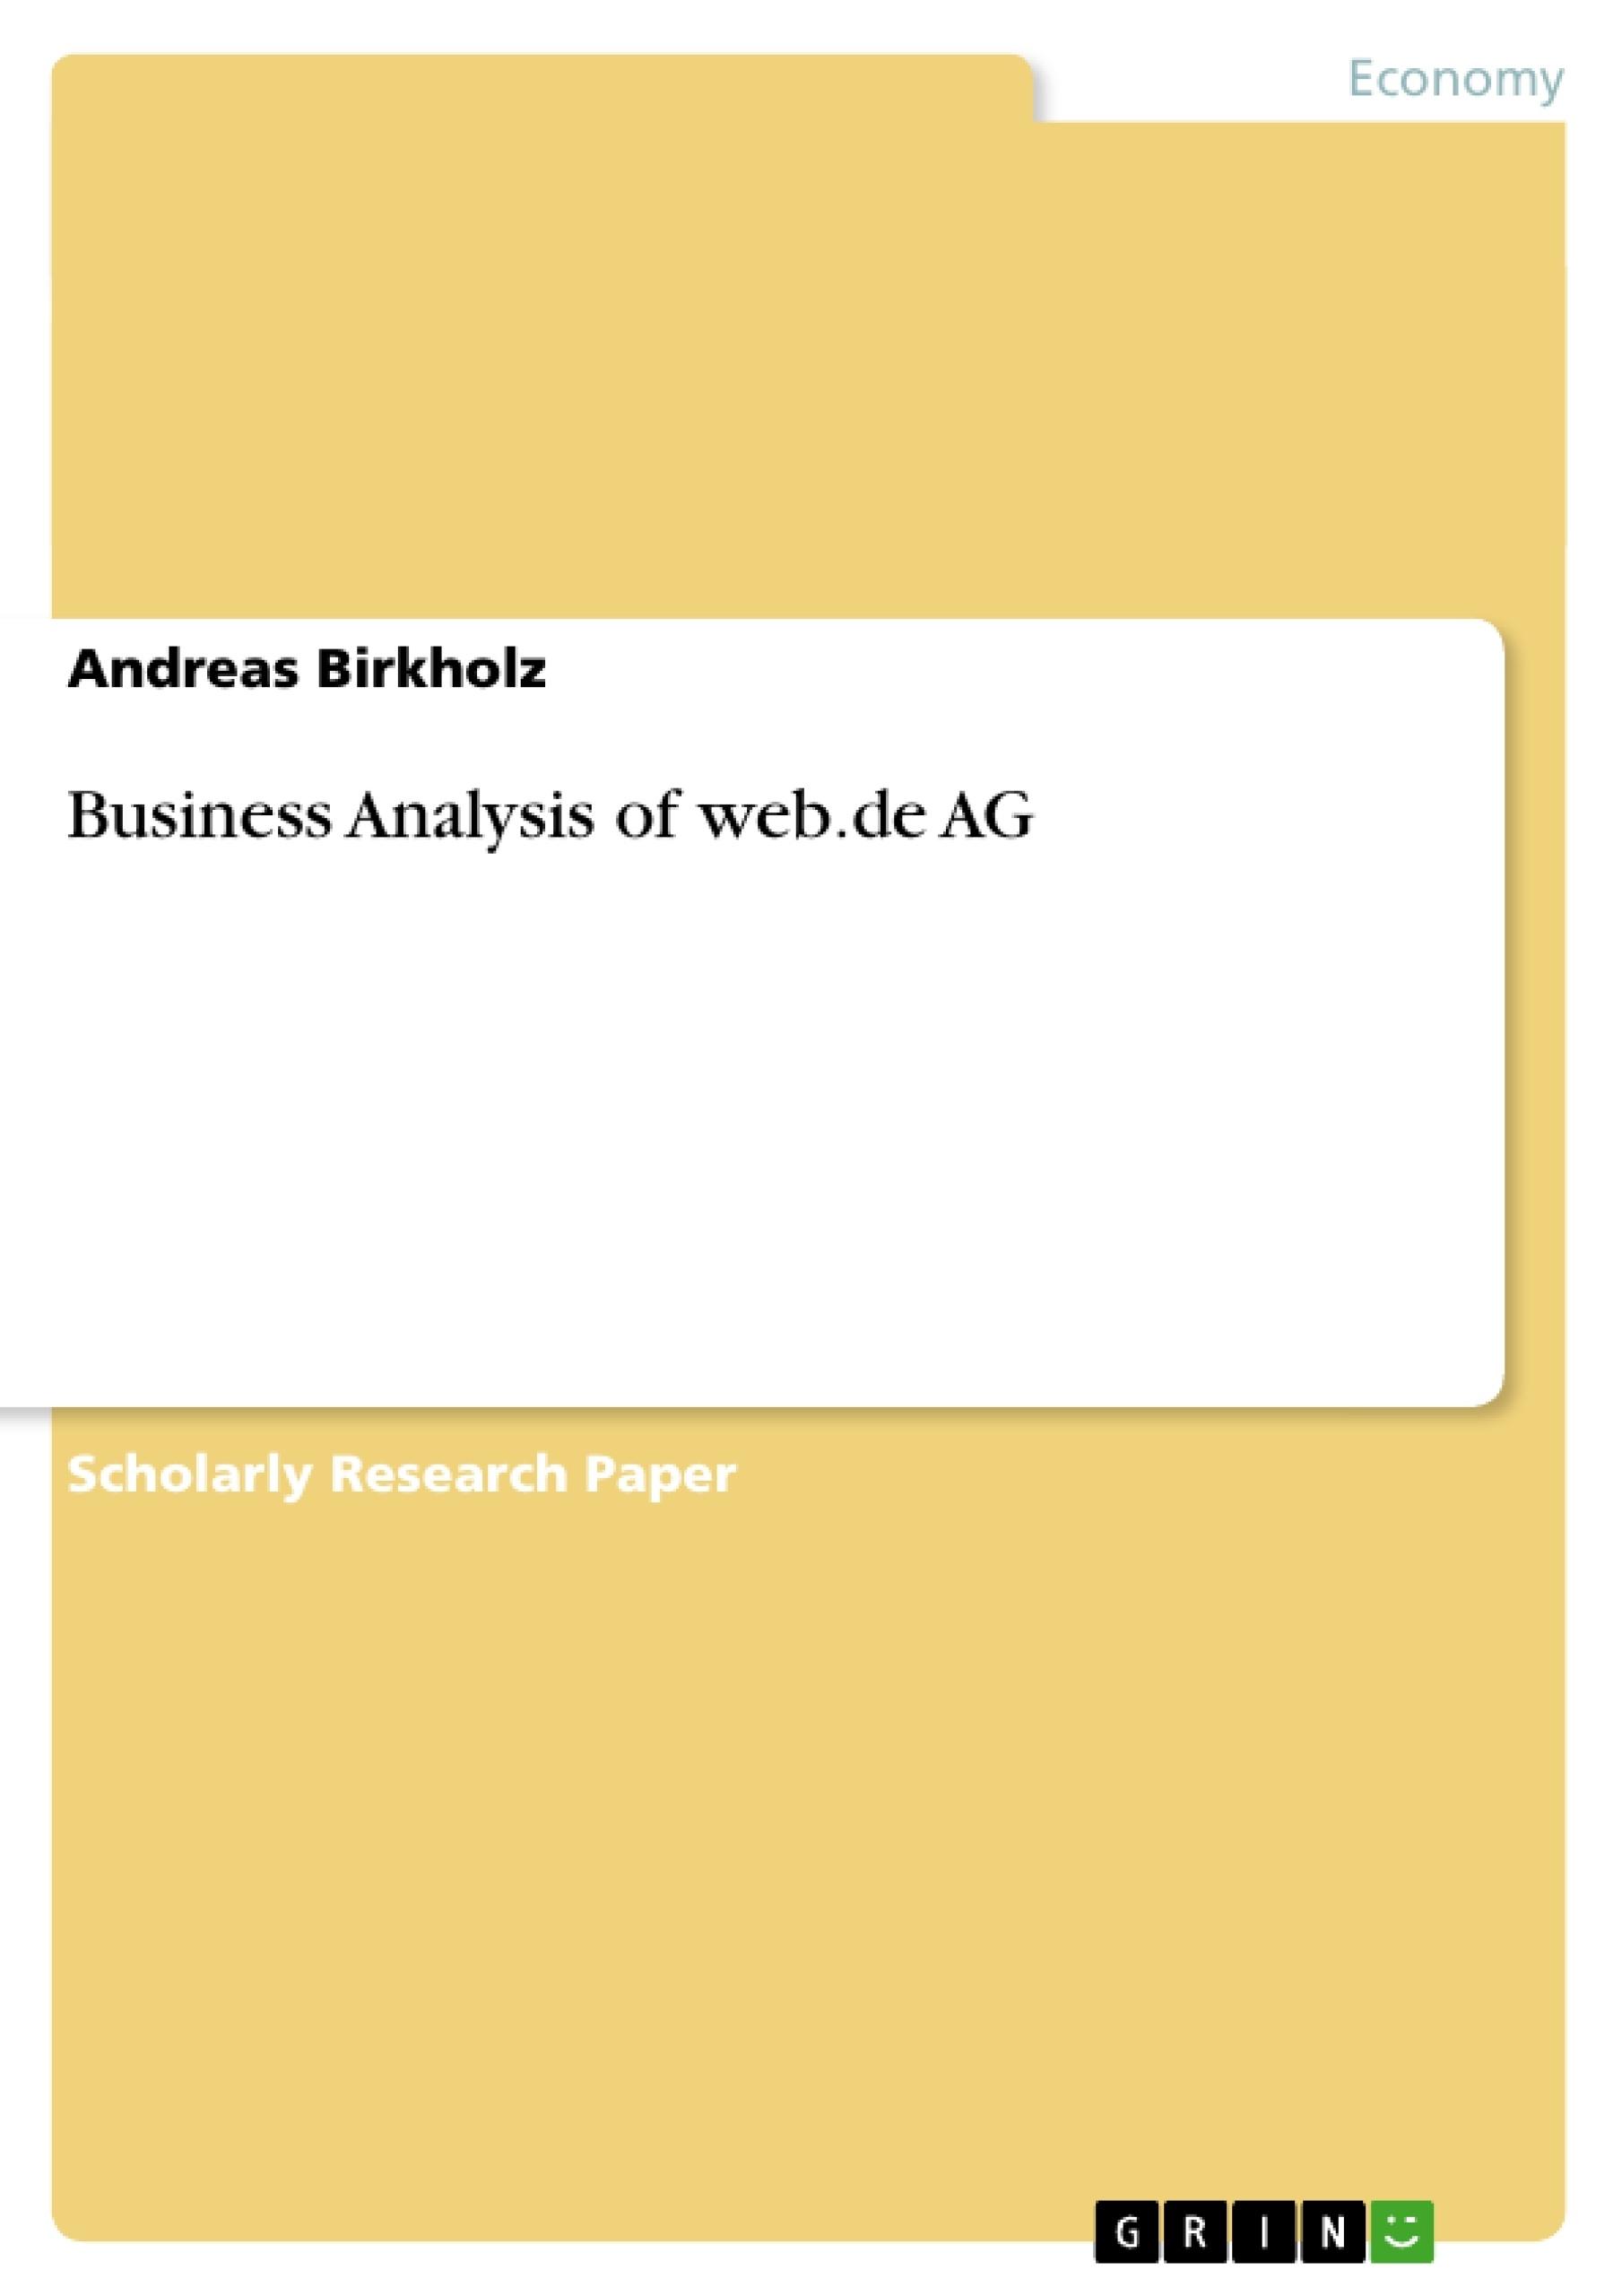 Title: Business Analysis of web.de AG